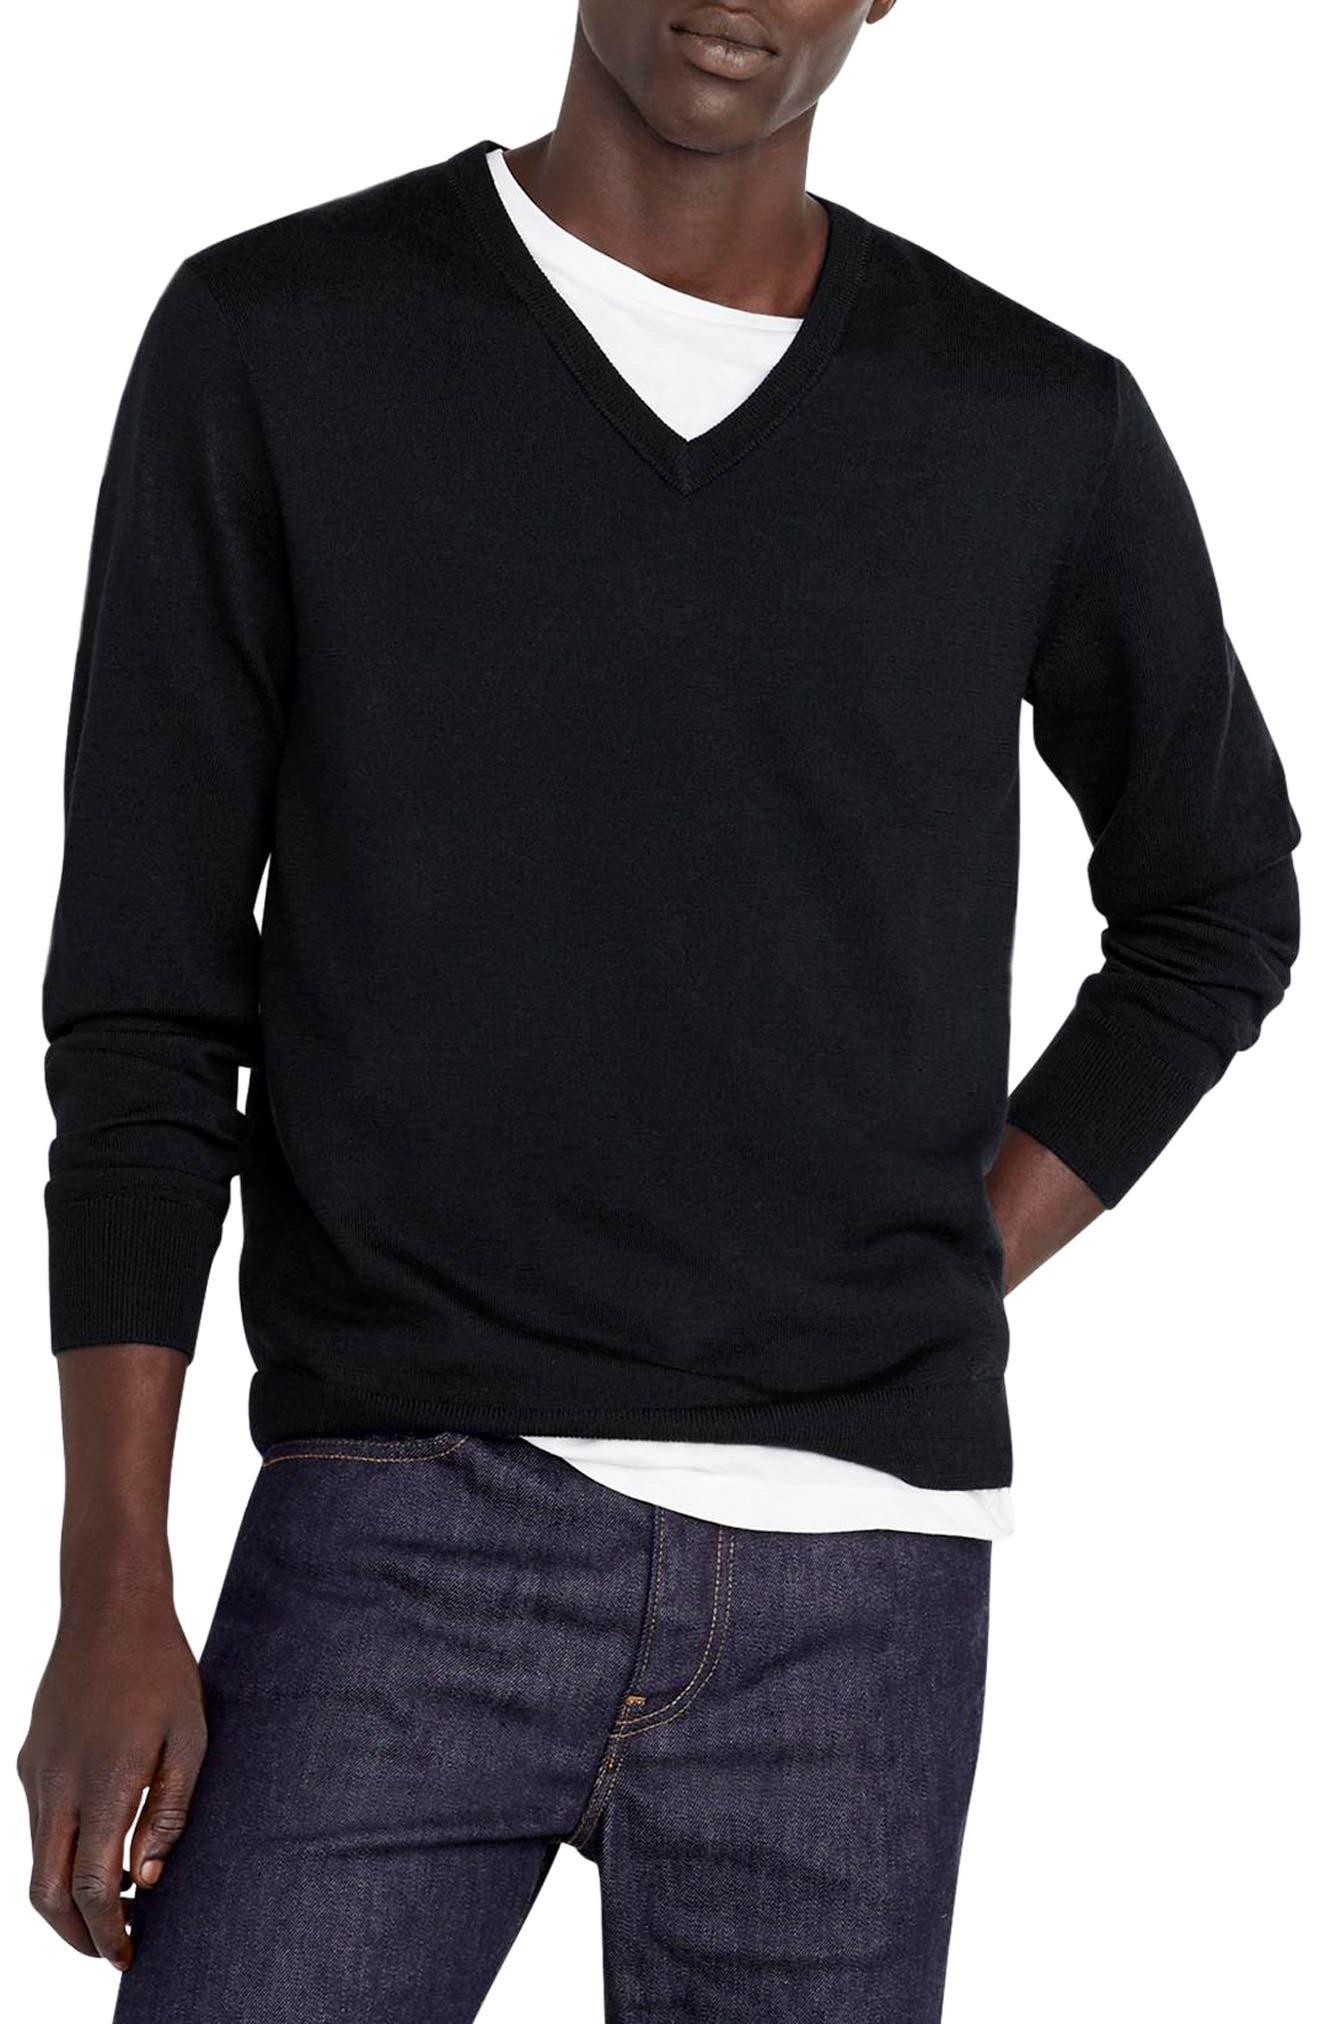 V-Neck Merino Wool Sweater,                             Main thumbnail 1, color,                             001